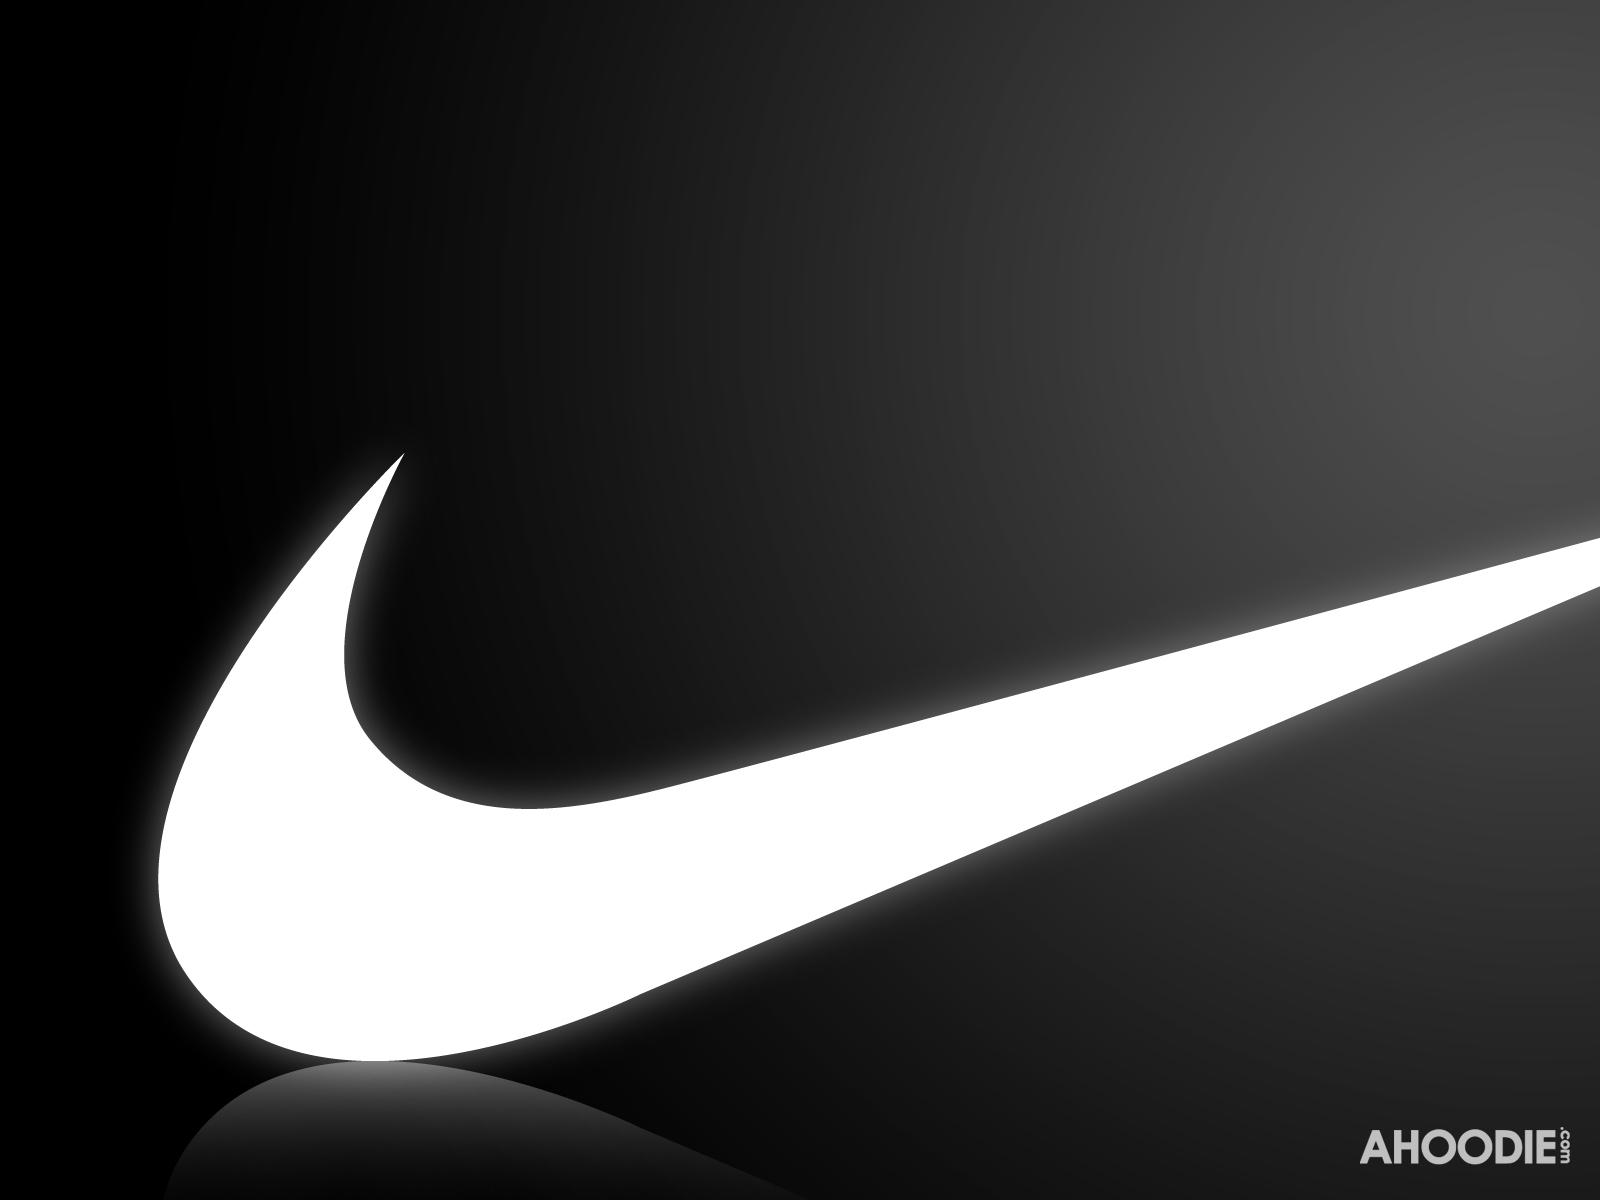 Nike Swoosh Wallpapers: Premier All Logos: Nike Logo